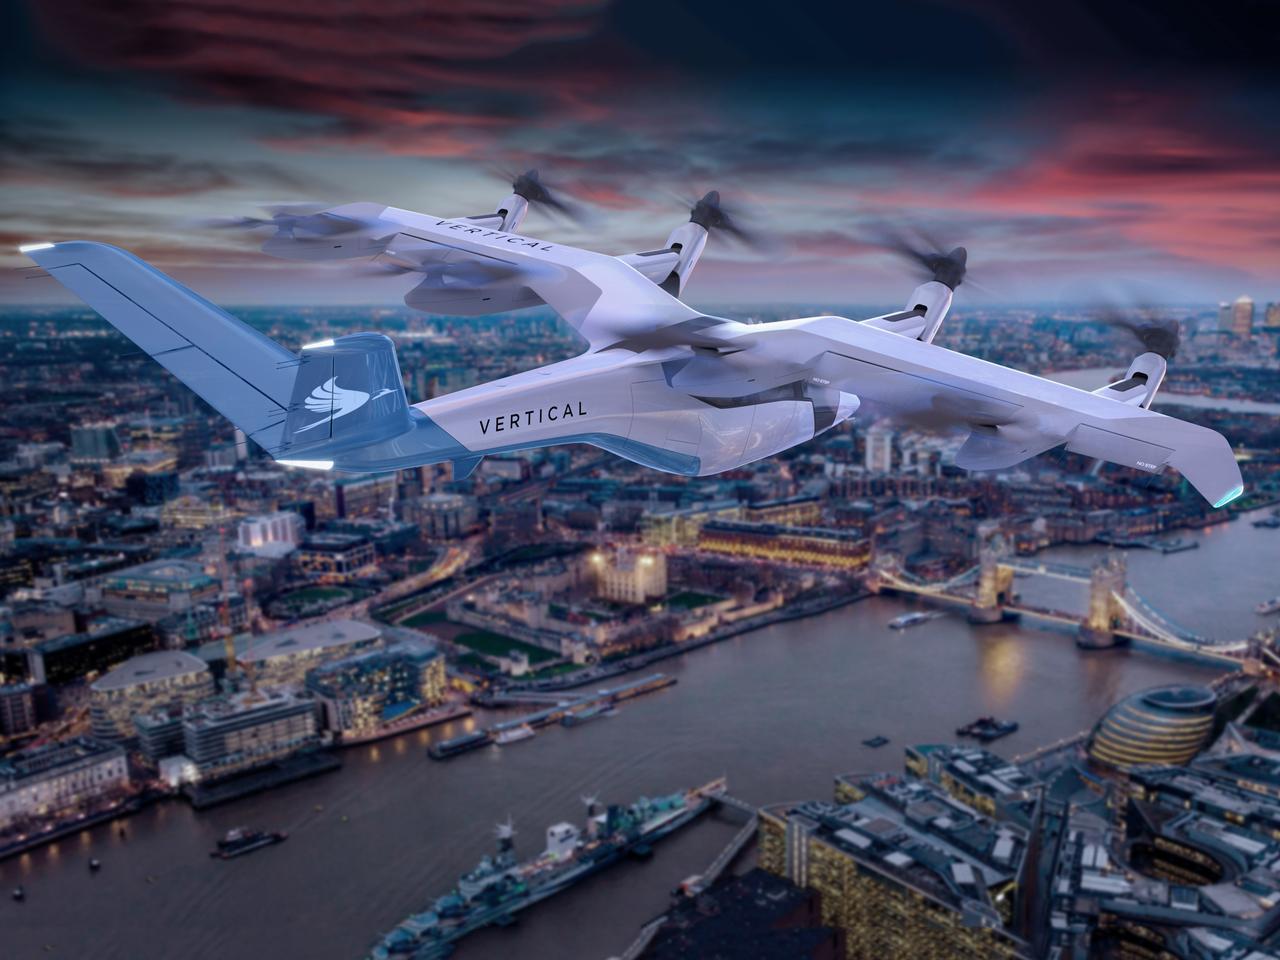 Vertical Aerospace has unveiled the design of its upcoming VA-1X tilt-rotor eVTOL air taxi